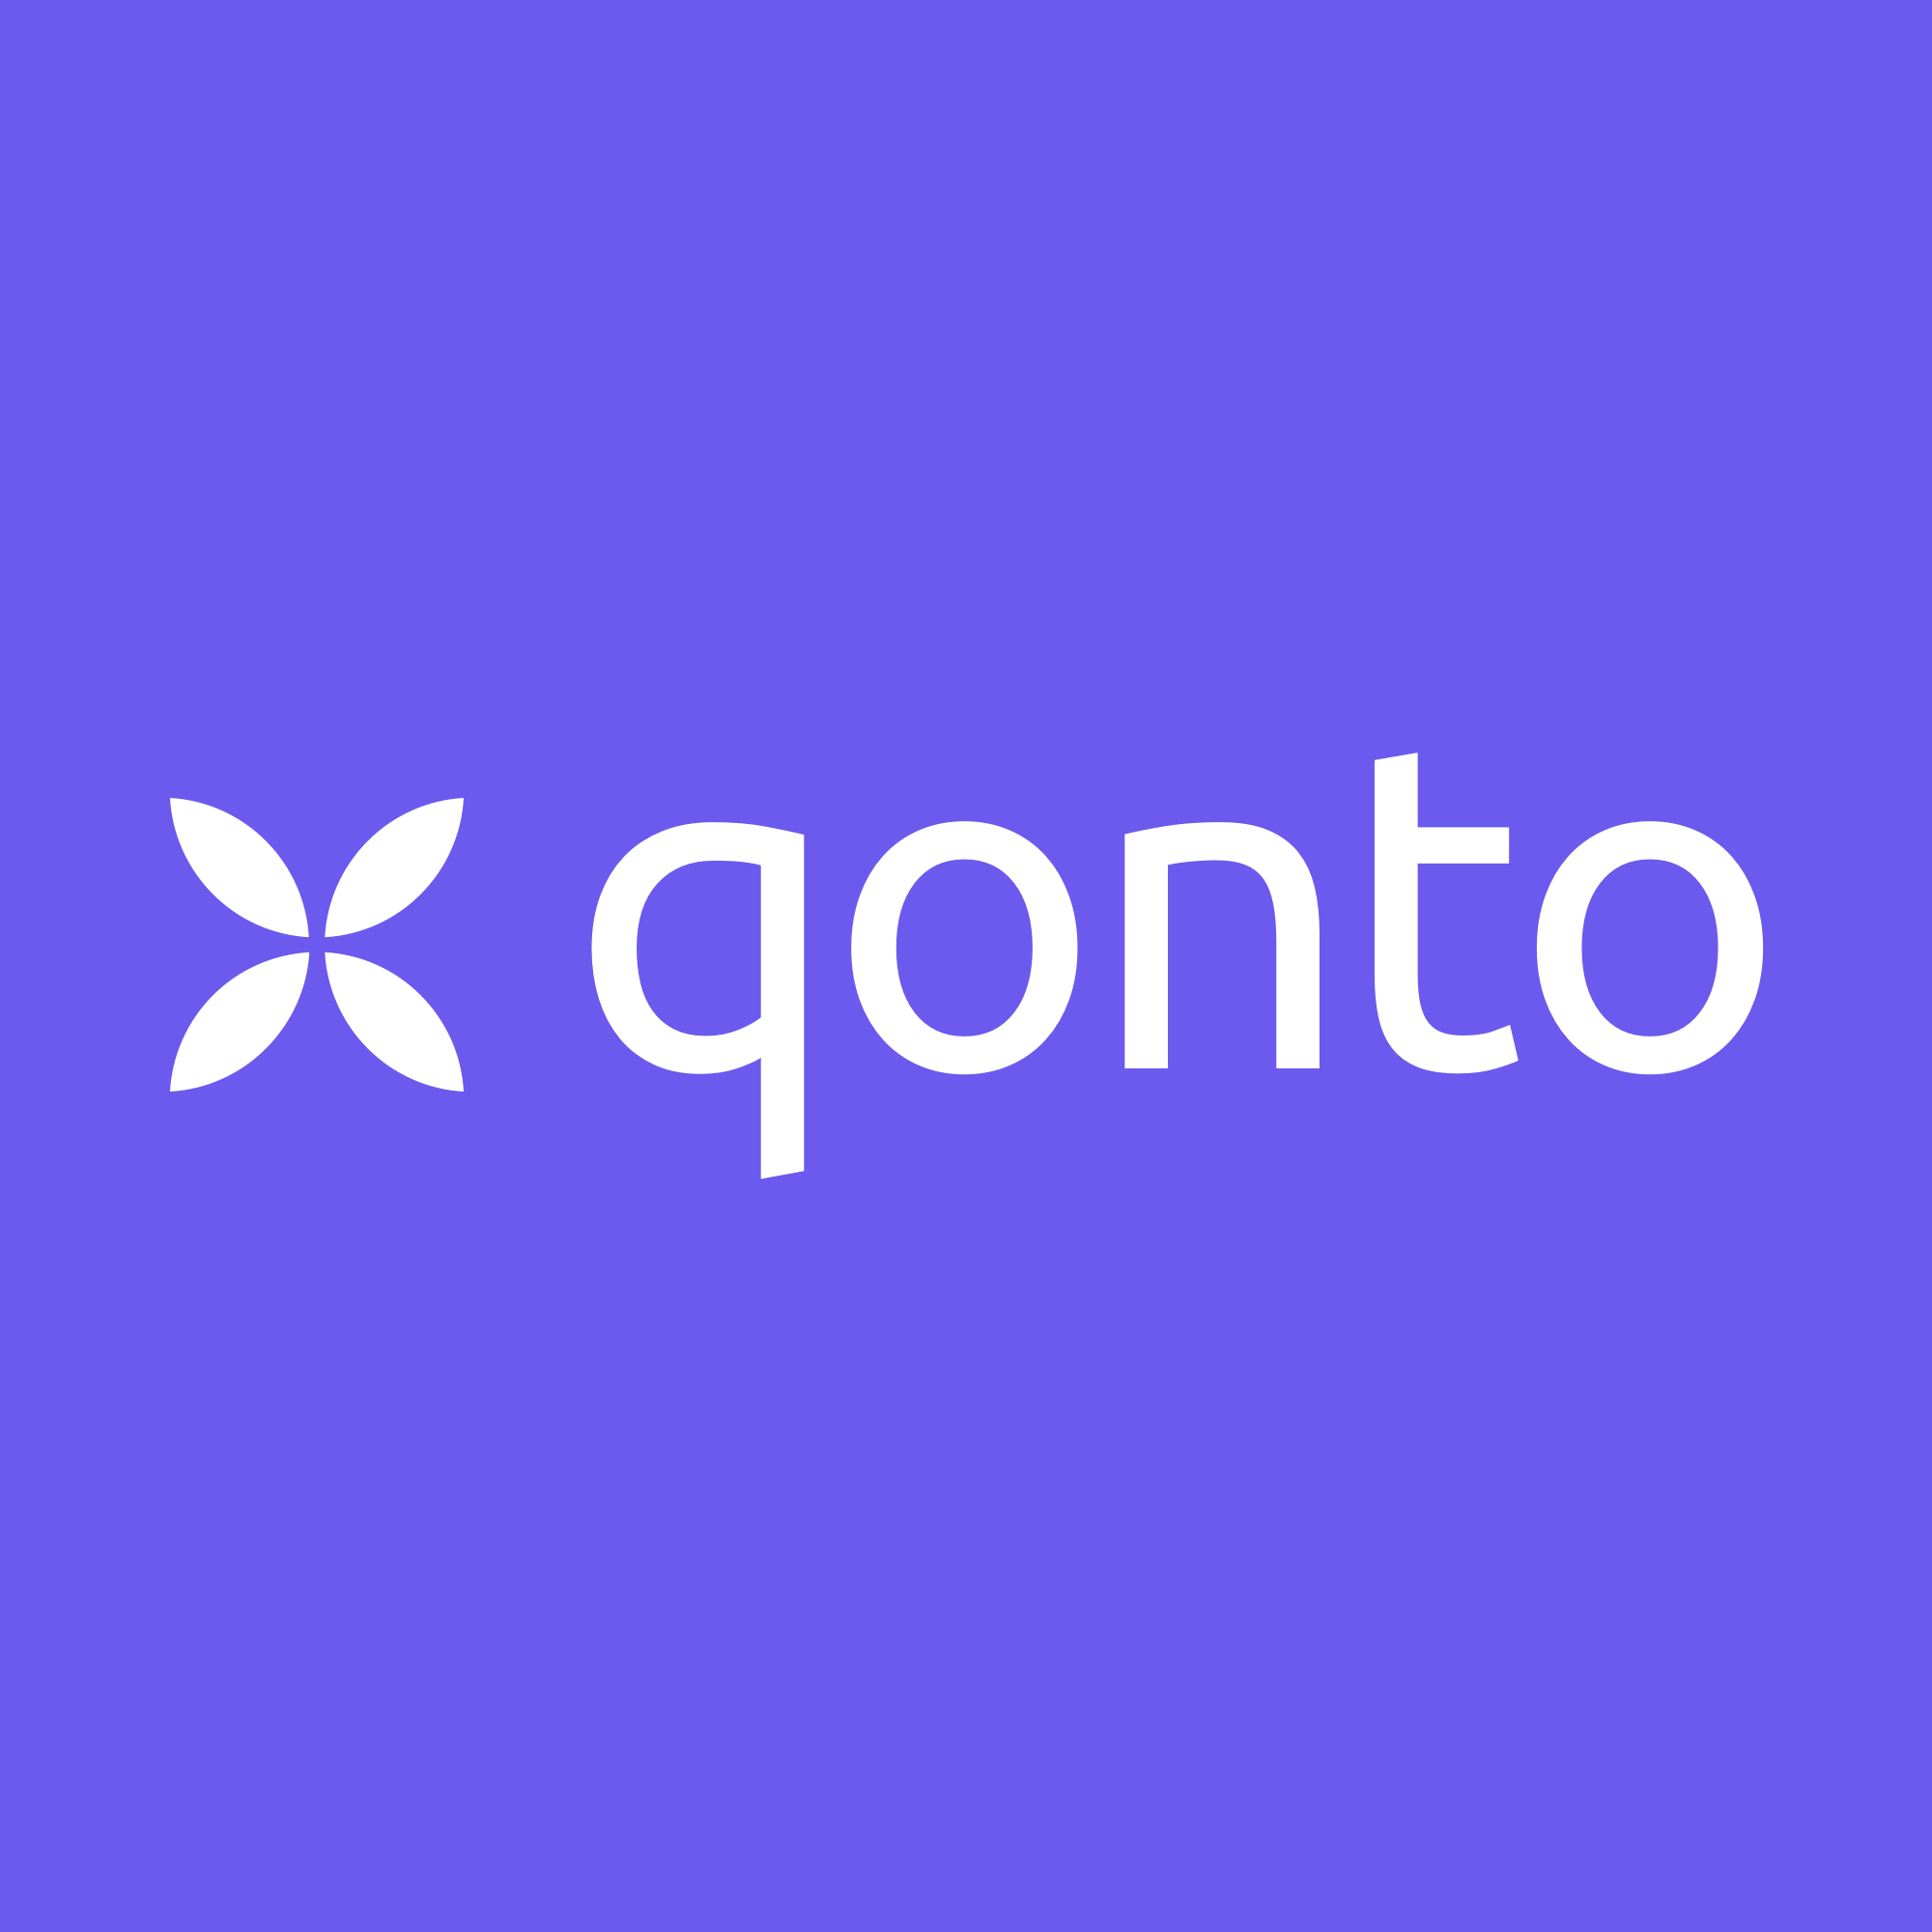 Qonto's logo